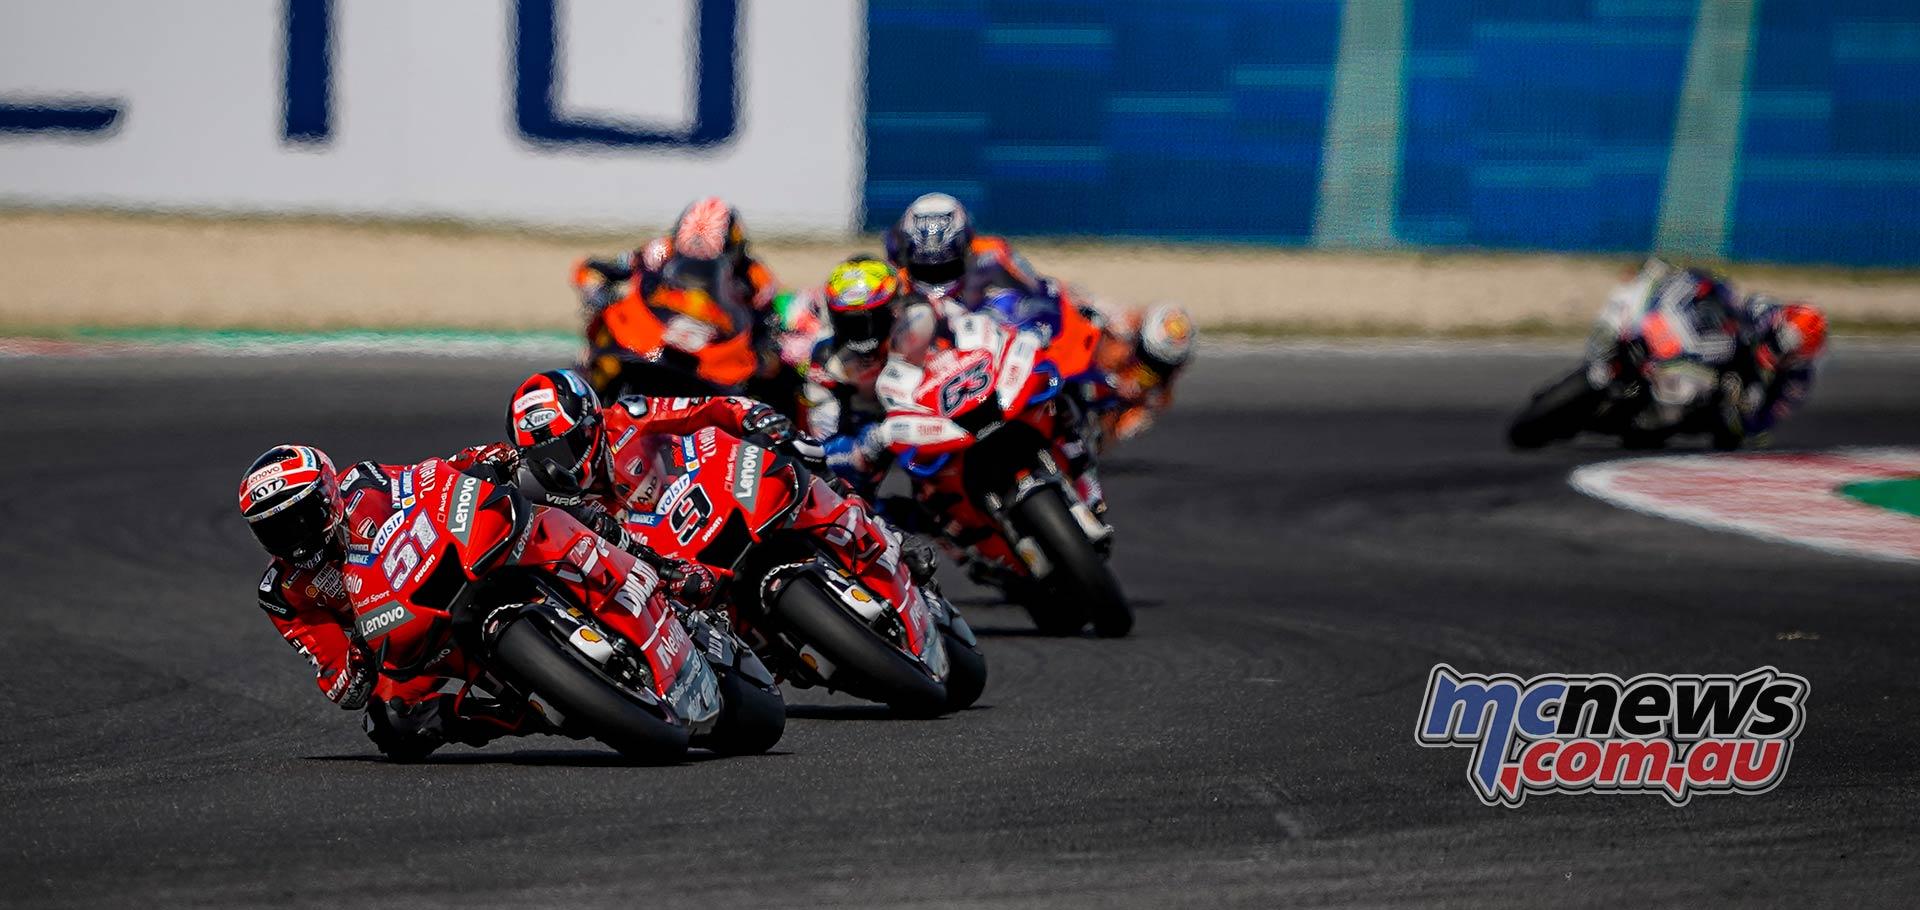 MotoGP Rnd Misano Pirro Petrucci Bagnaia